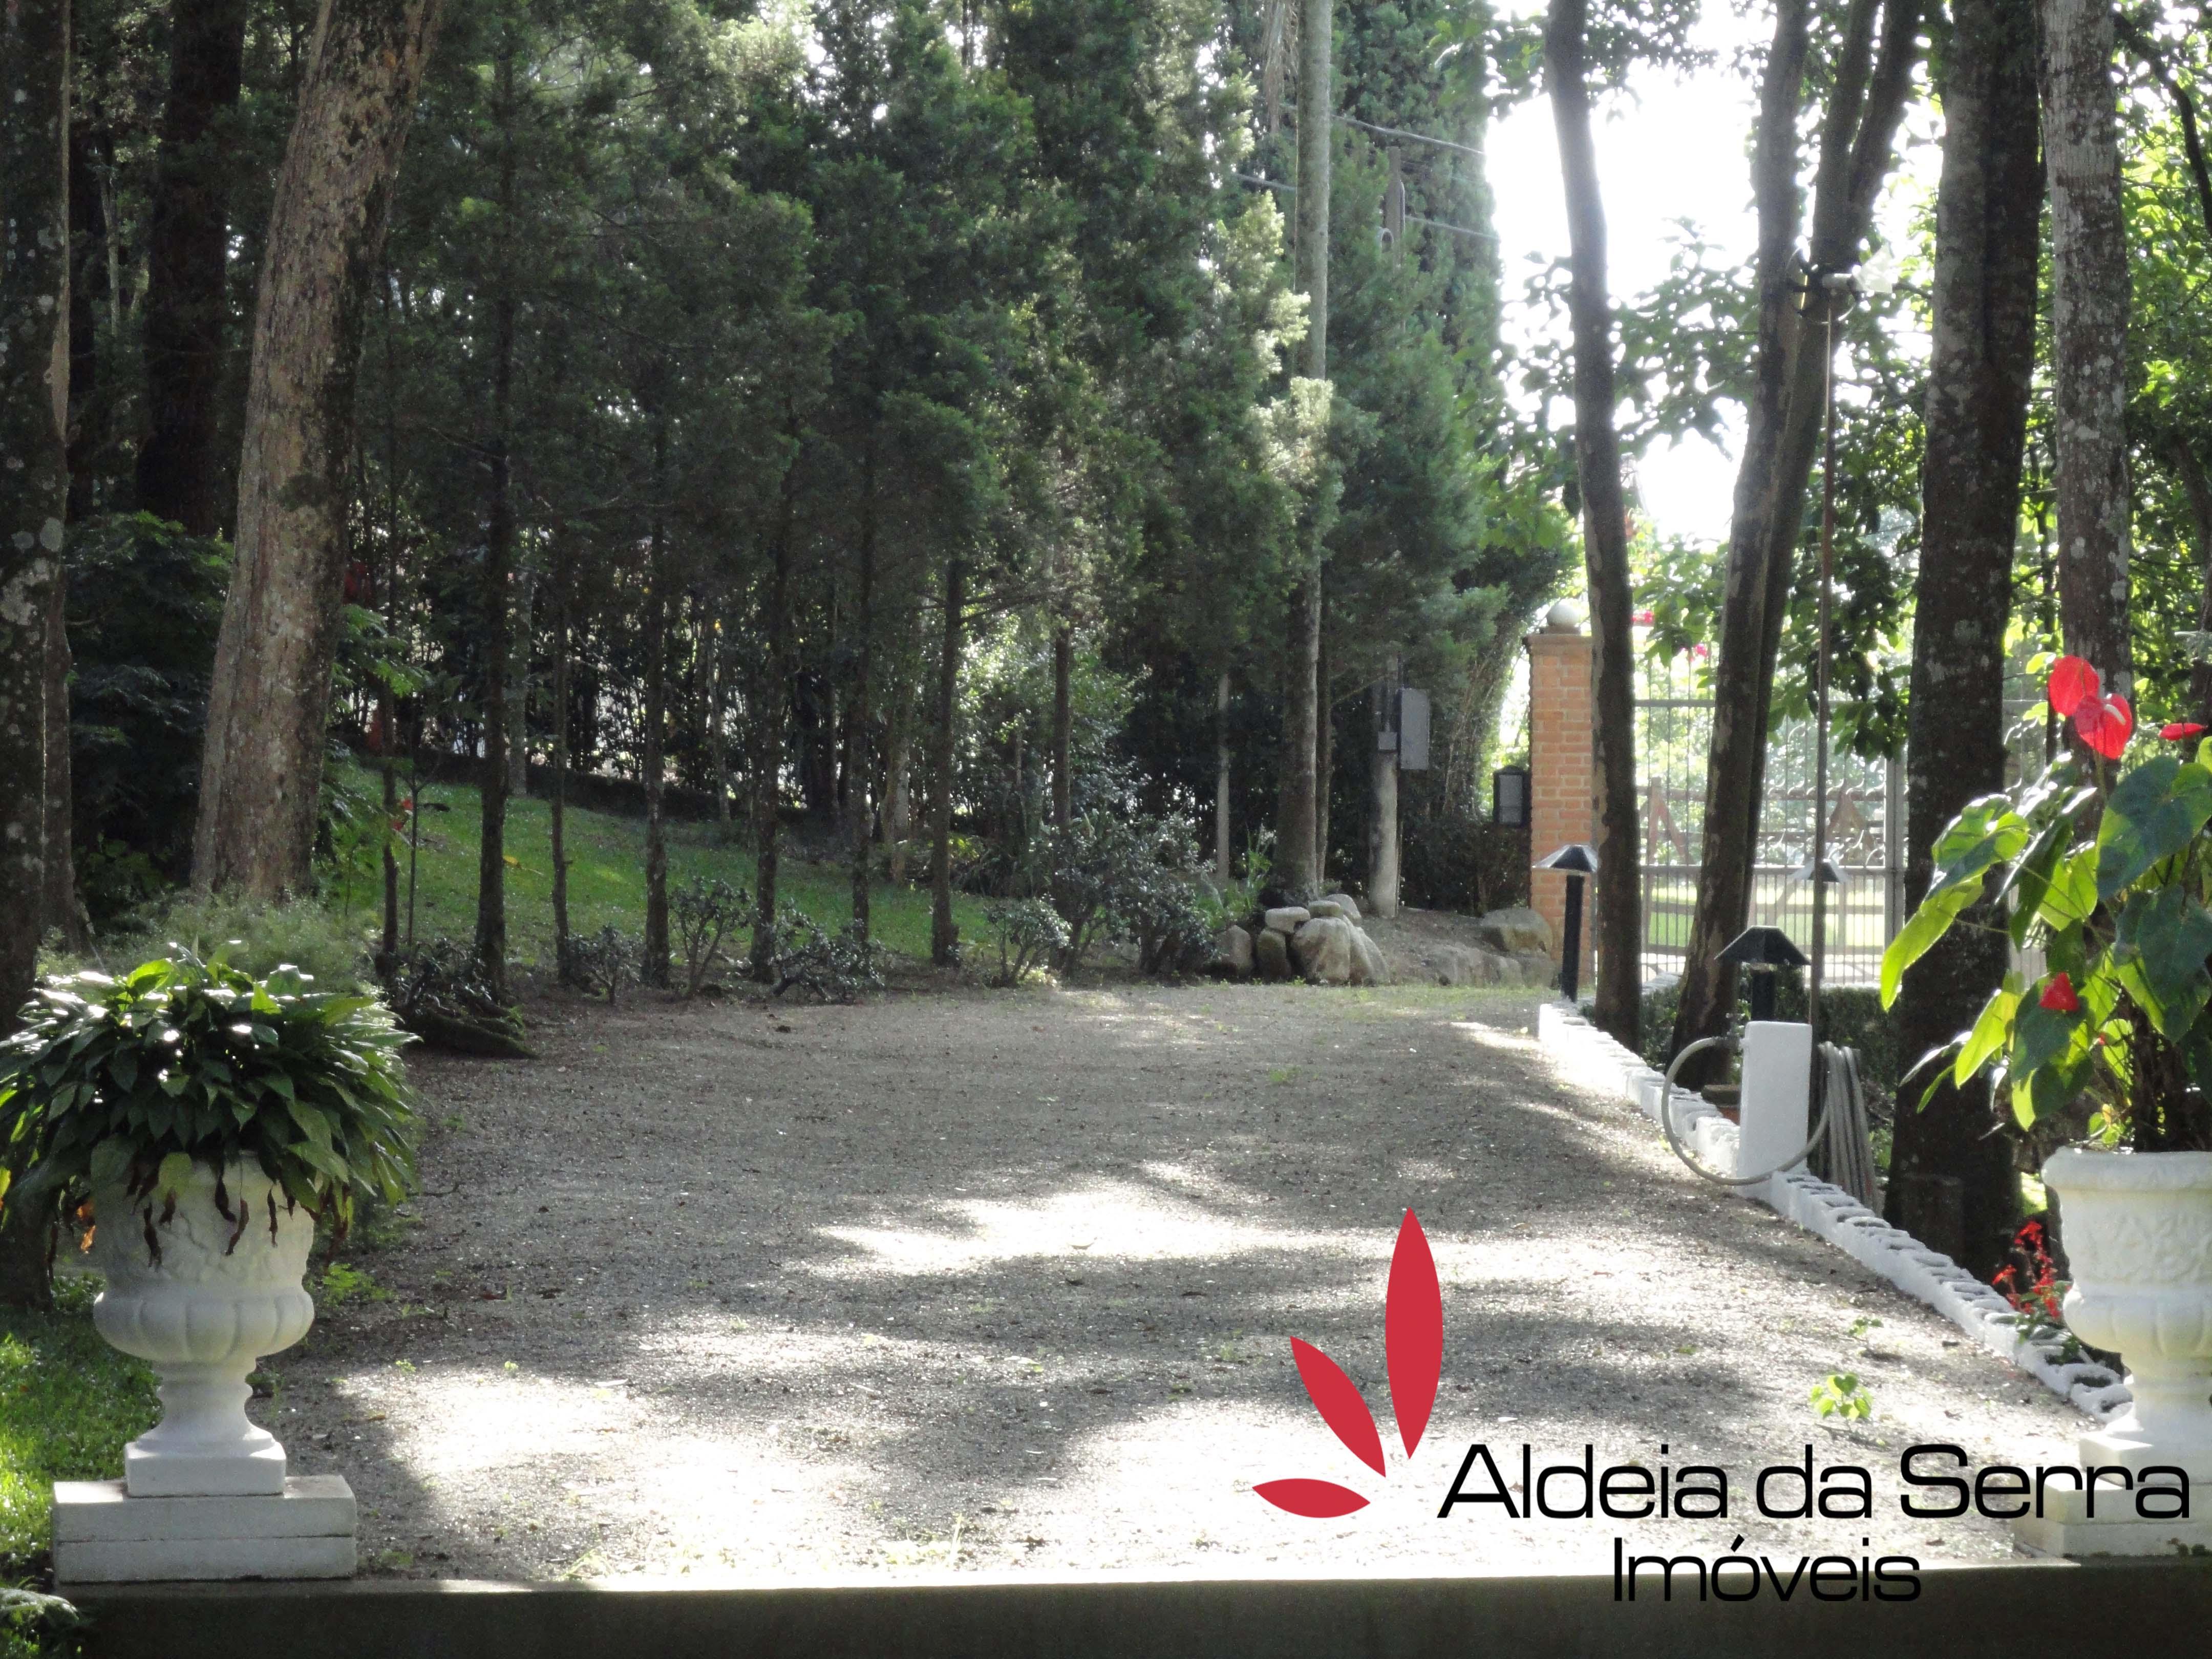 /admin/imoveis/fotos/DSC00011.JPG Aldeia da Serra Imoveis